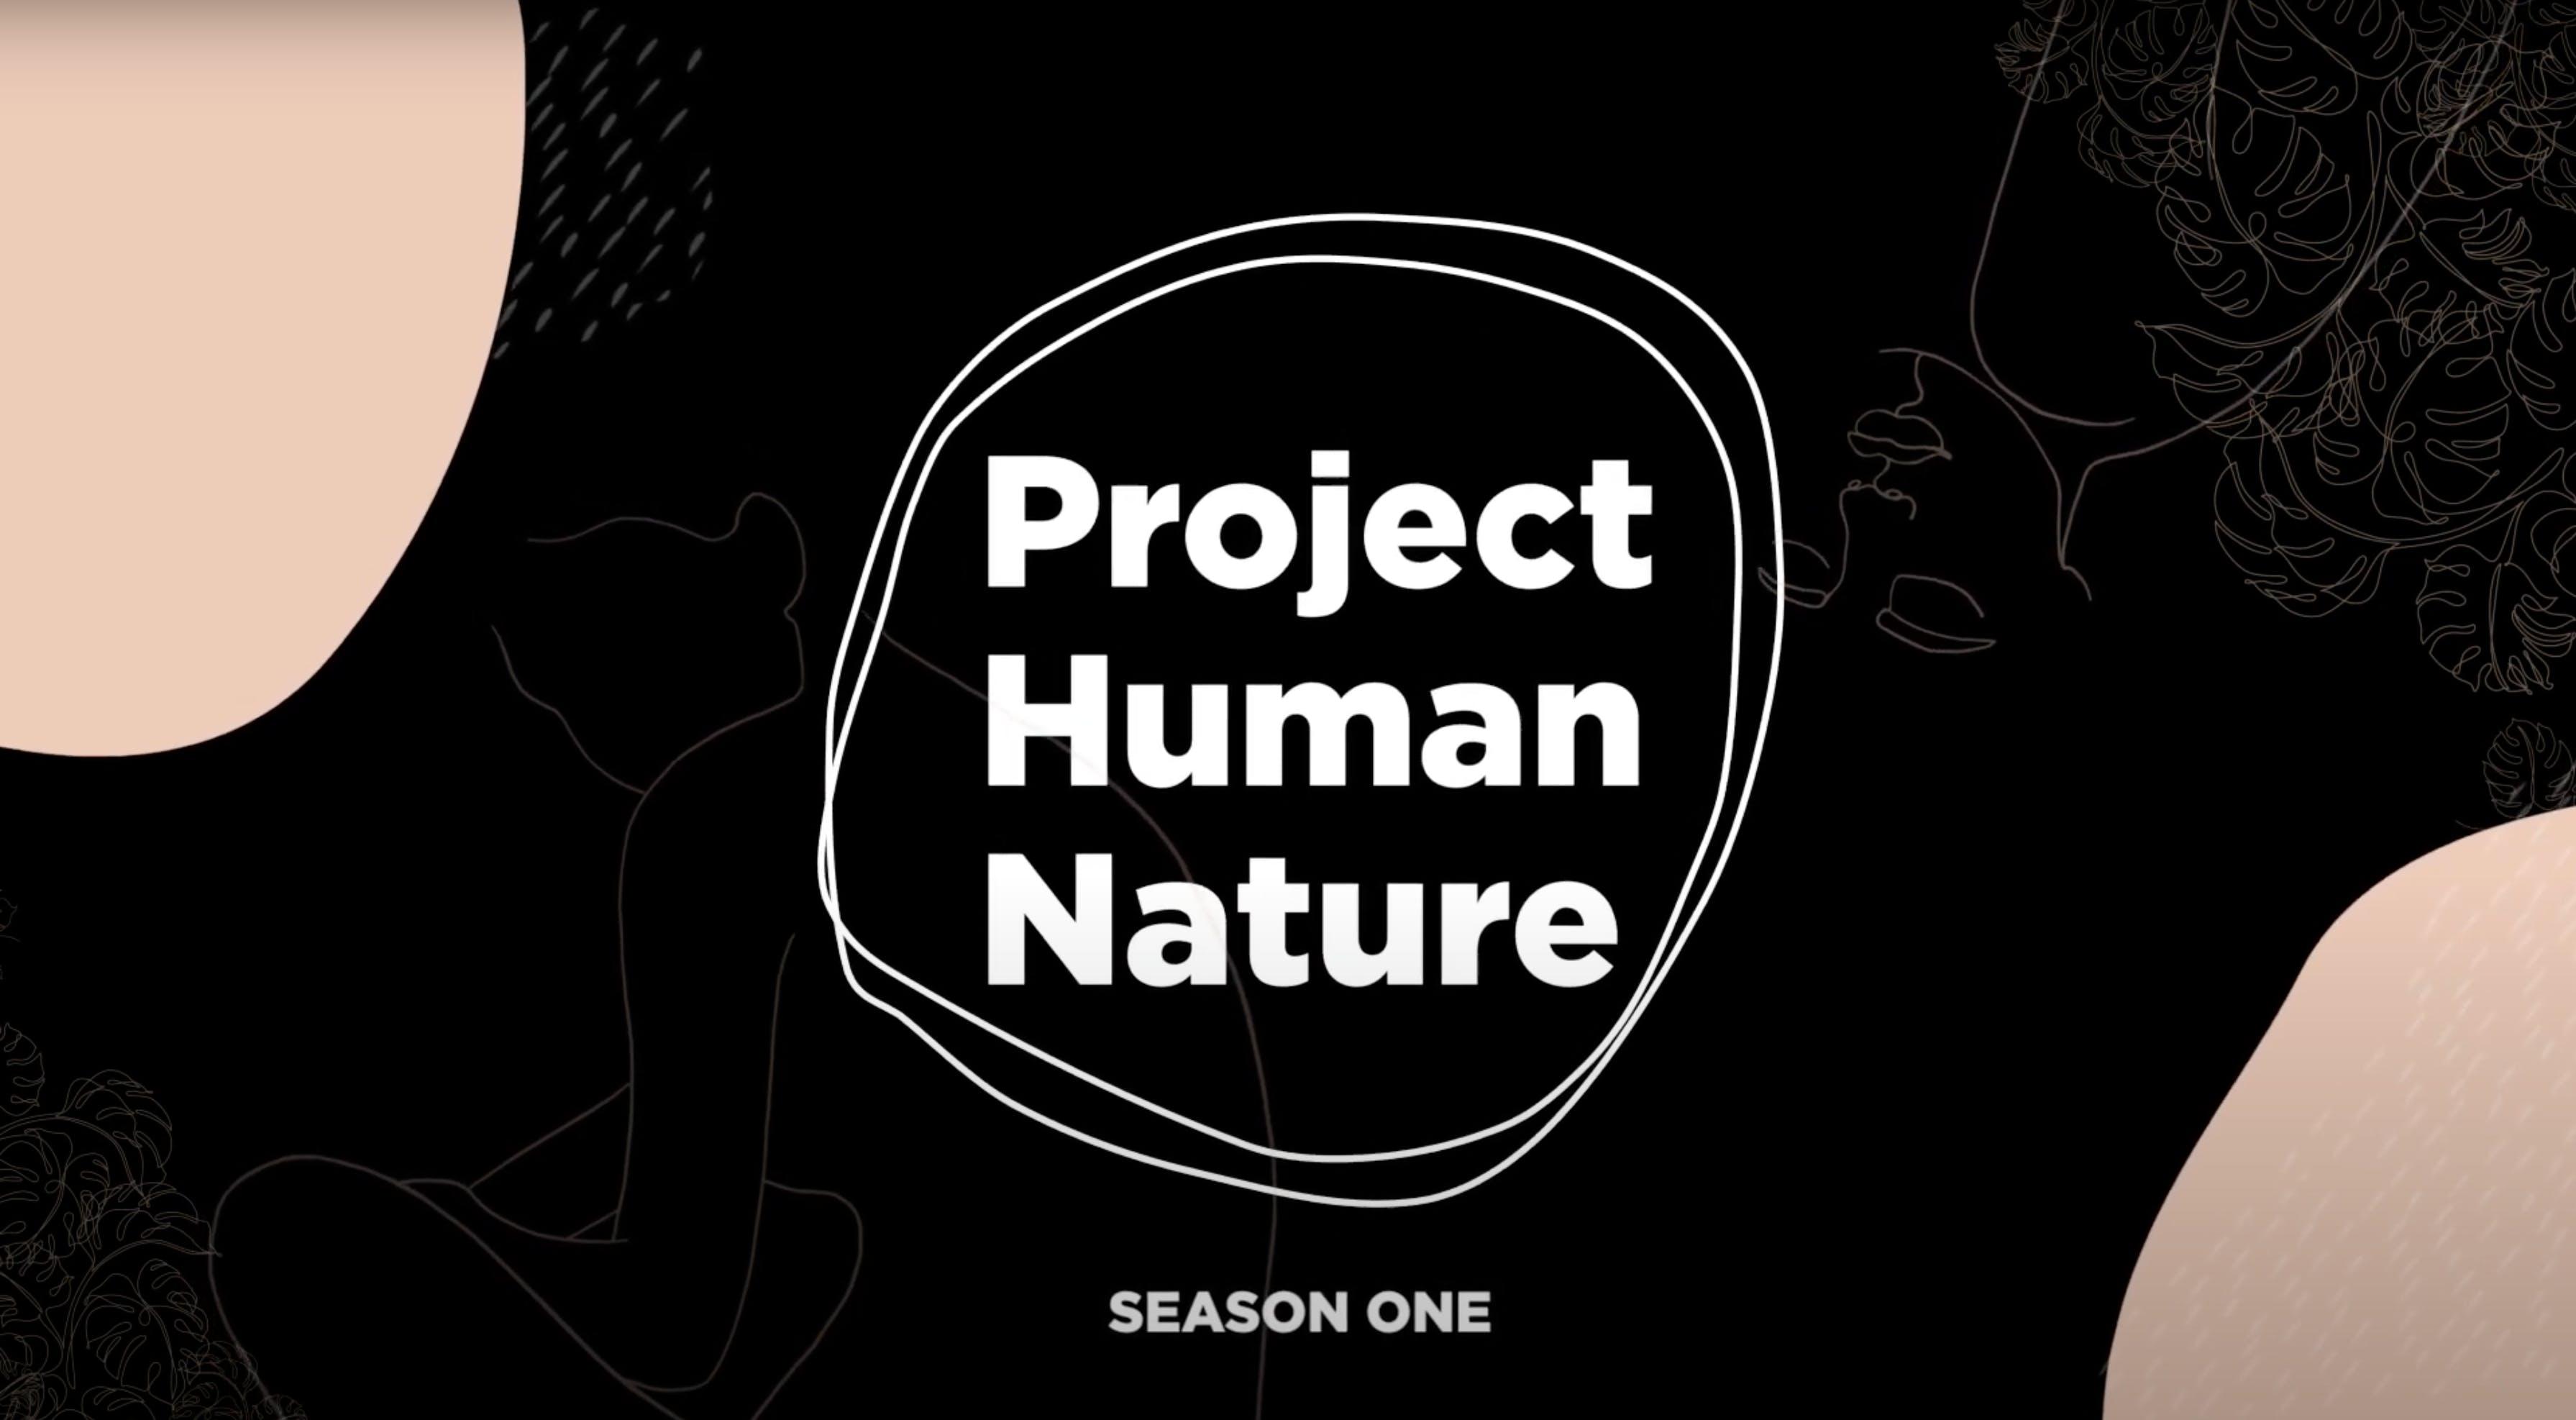 Project Human Nature Season 1